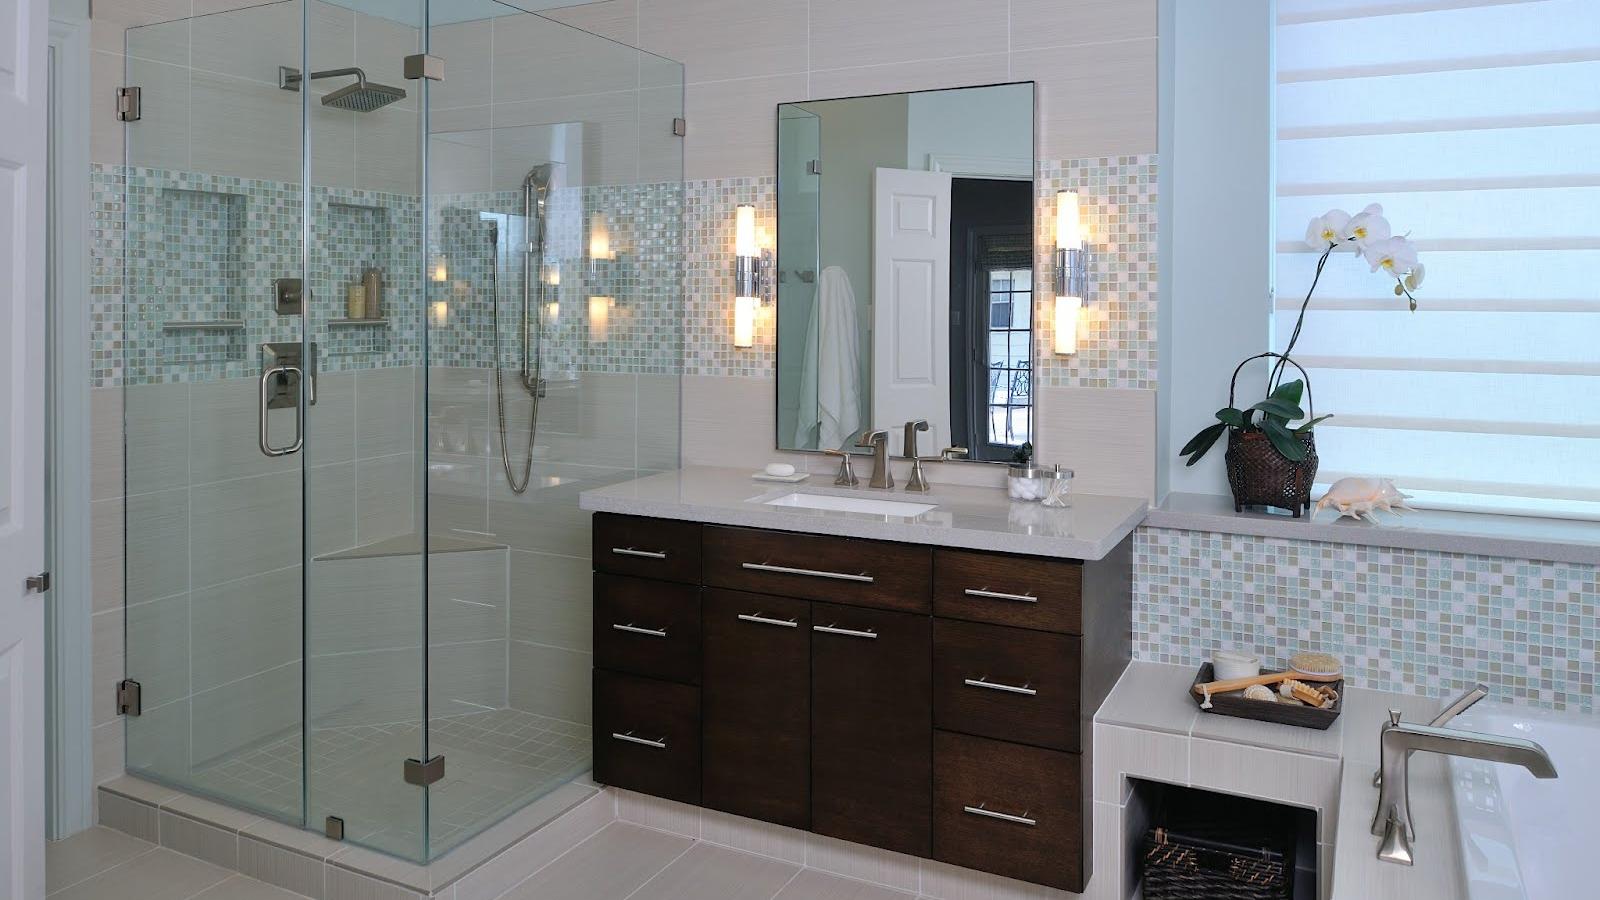 Interior Design Project Tour | A Matured Bath Is Modernized / DESIGNED by: Carla Aston